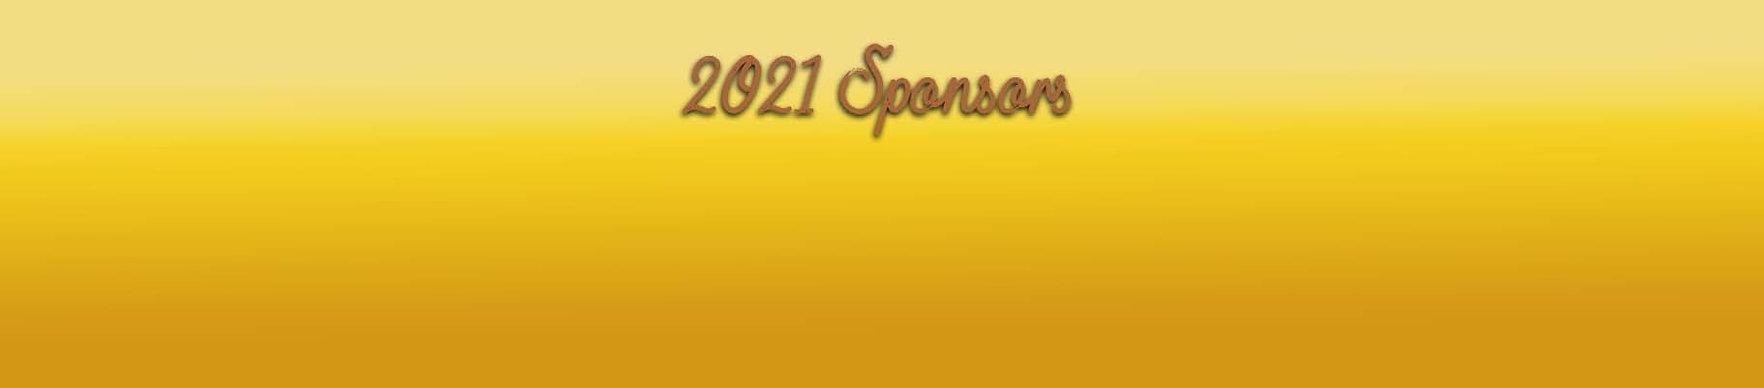 2021 Sponsors strip image no  logo.jpg